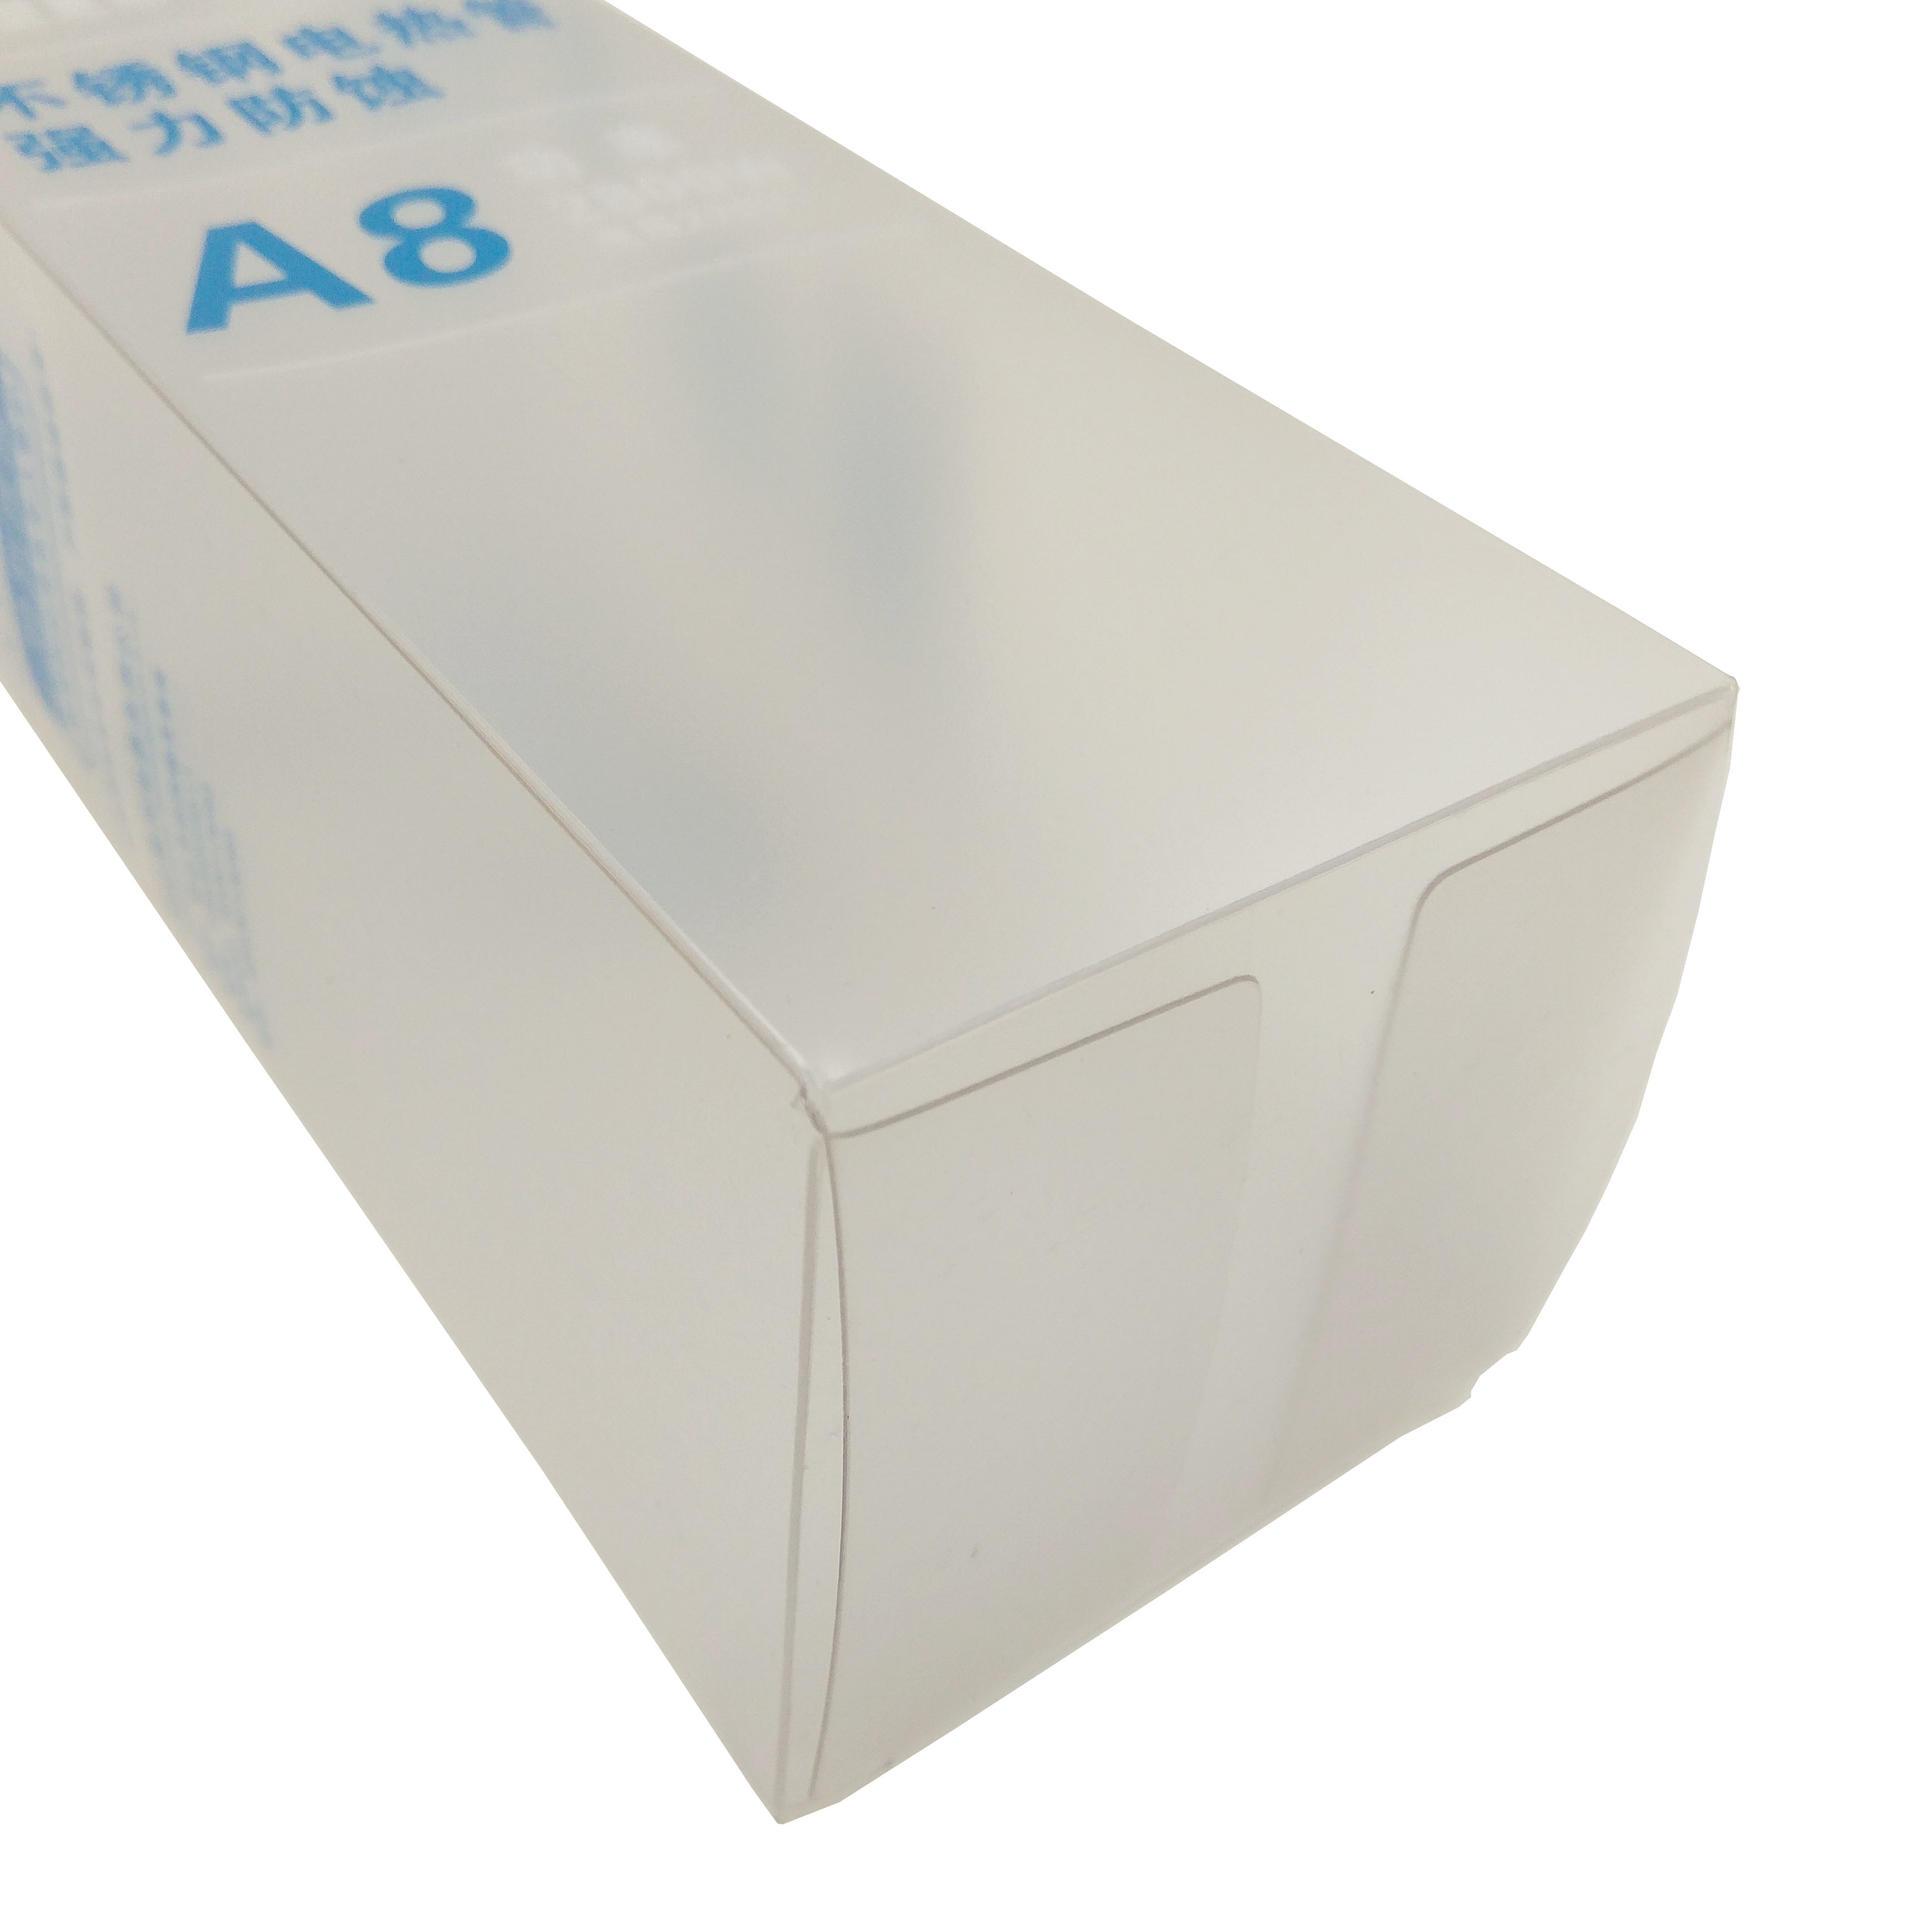 Custom Plastic Packaging Box with Matt Lamination on Surface